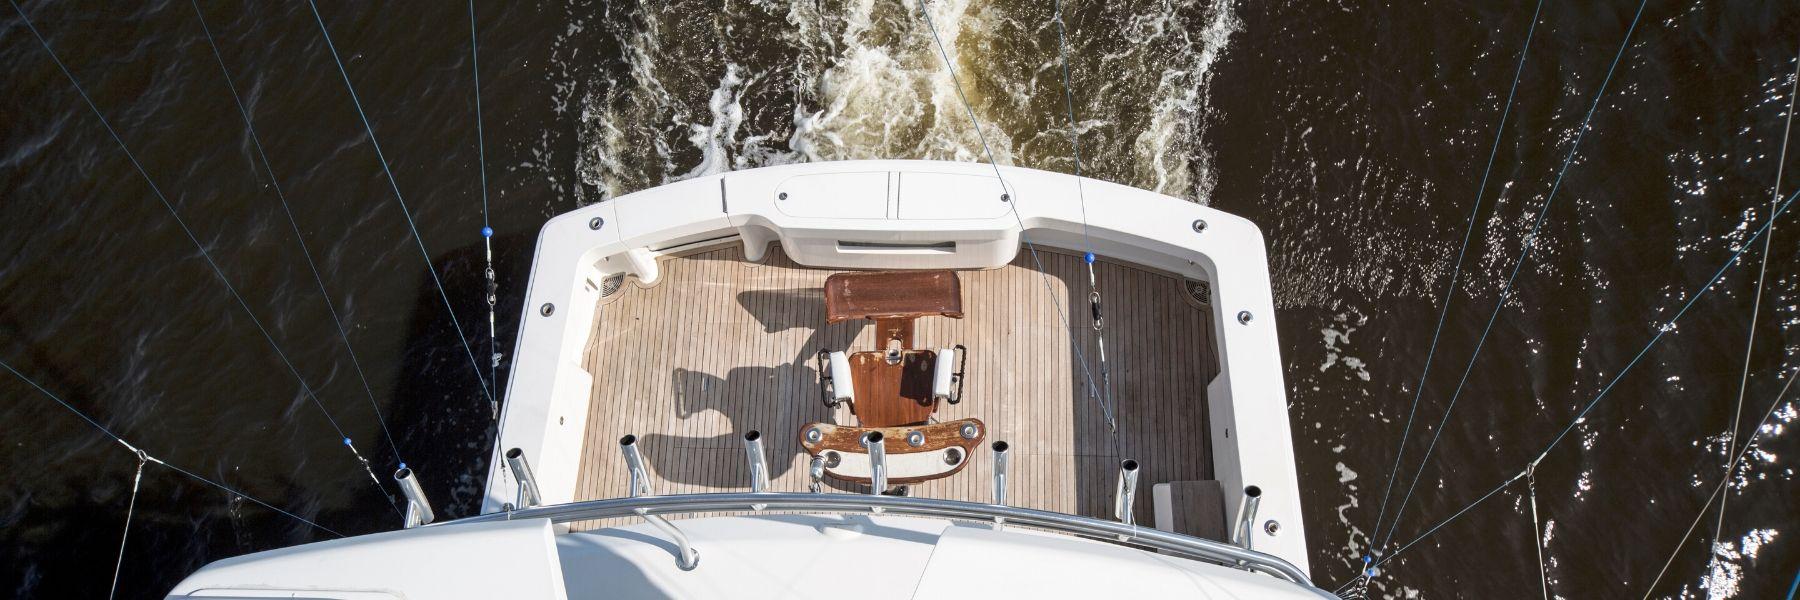 Stern of boat